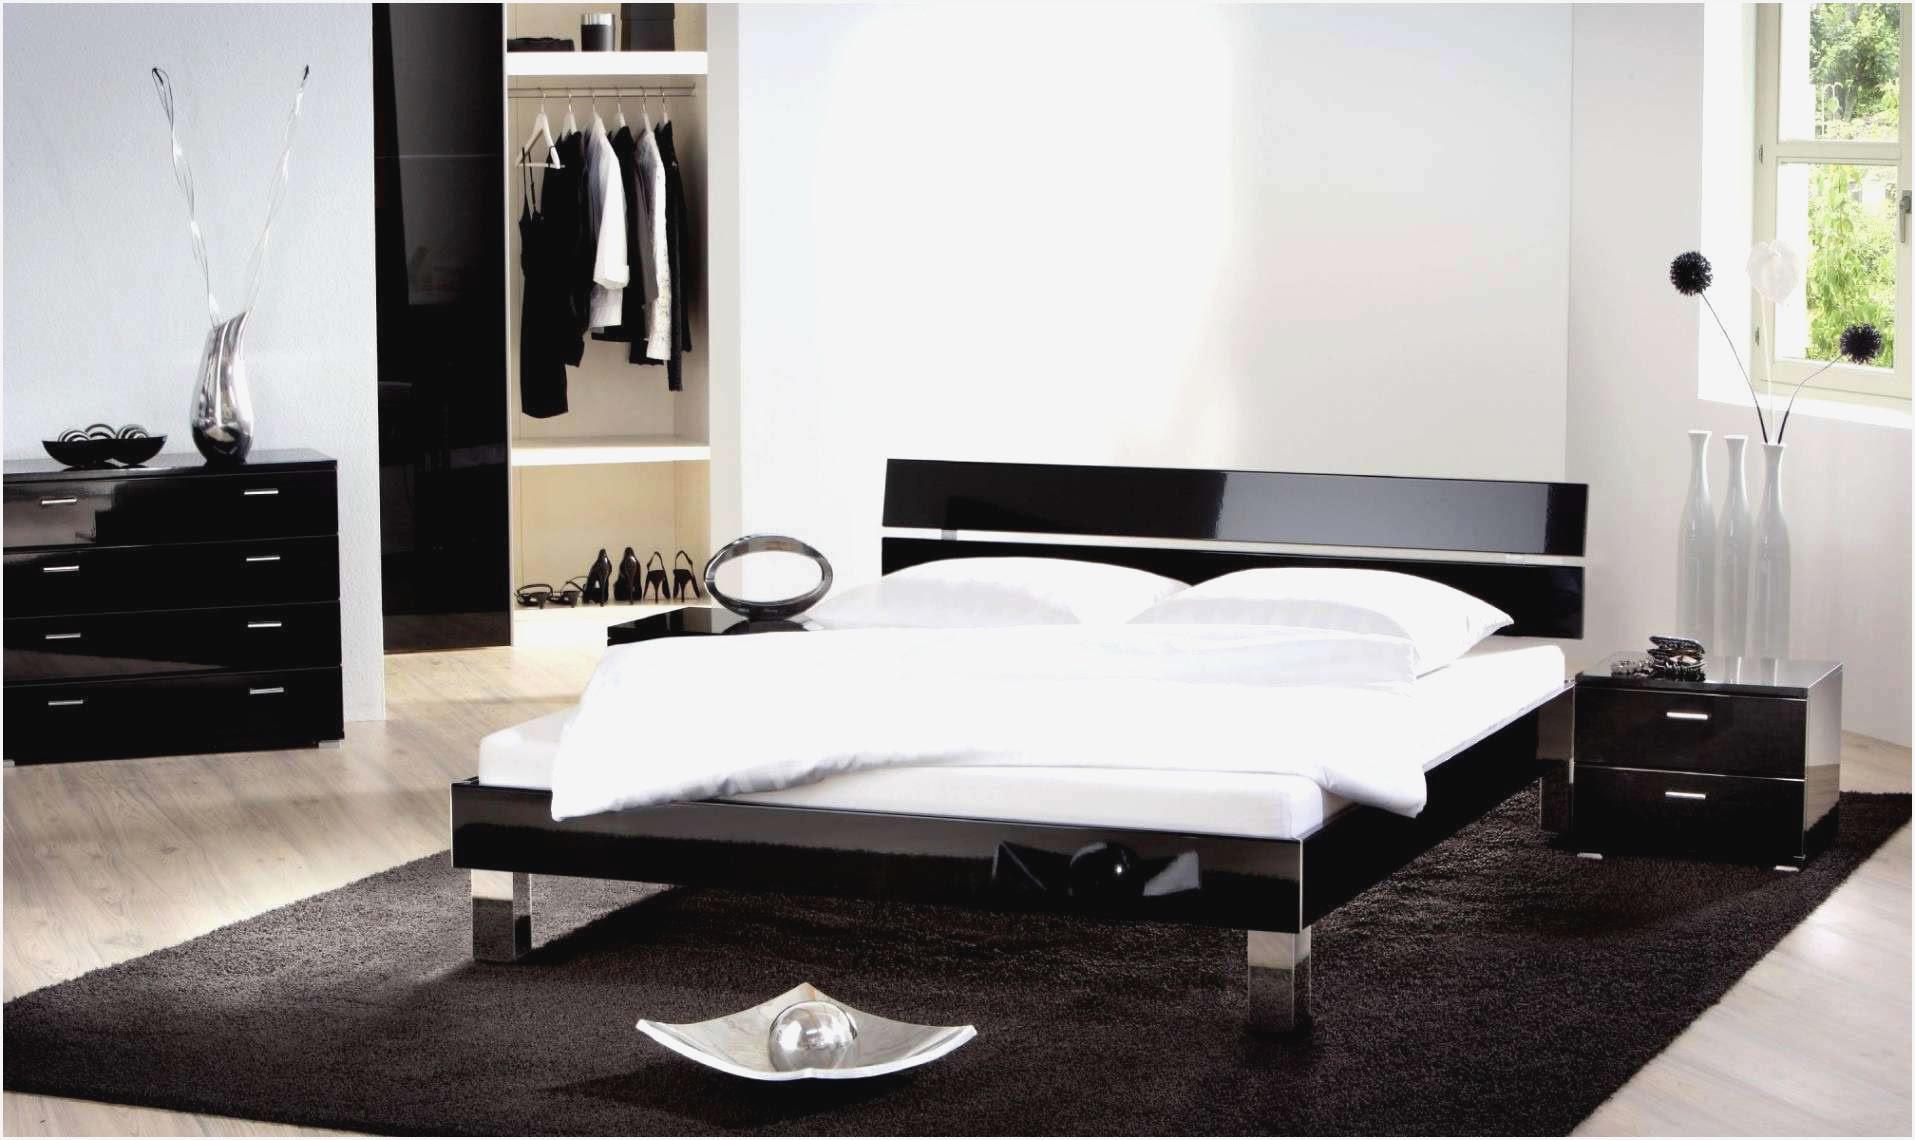 Schlafzimmer Wanddeko Ideen Wanddekoration Ikea Holz ...